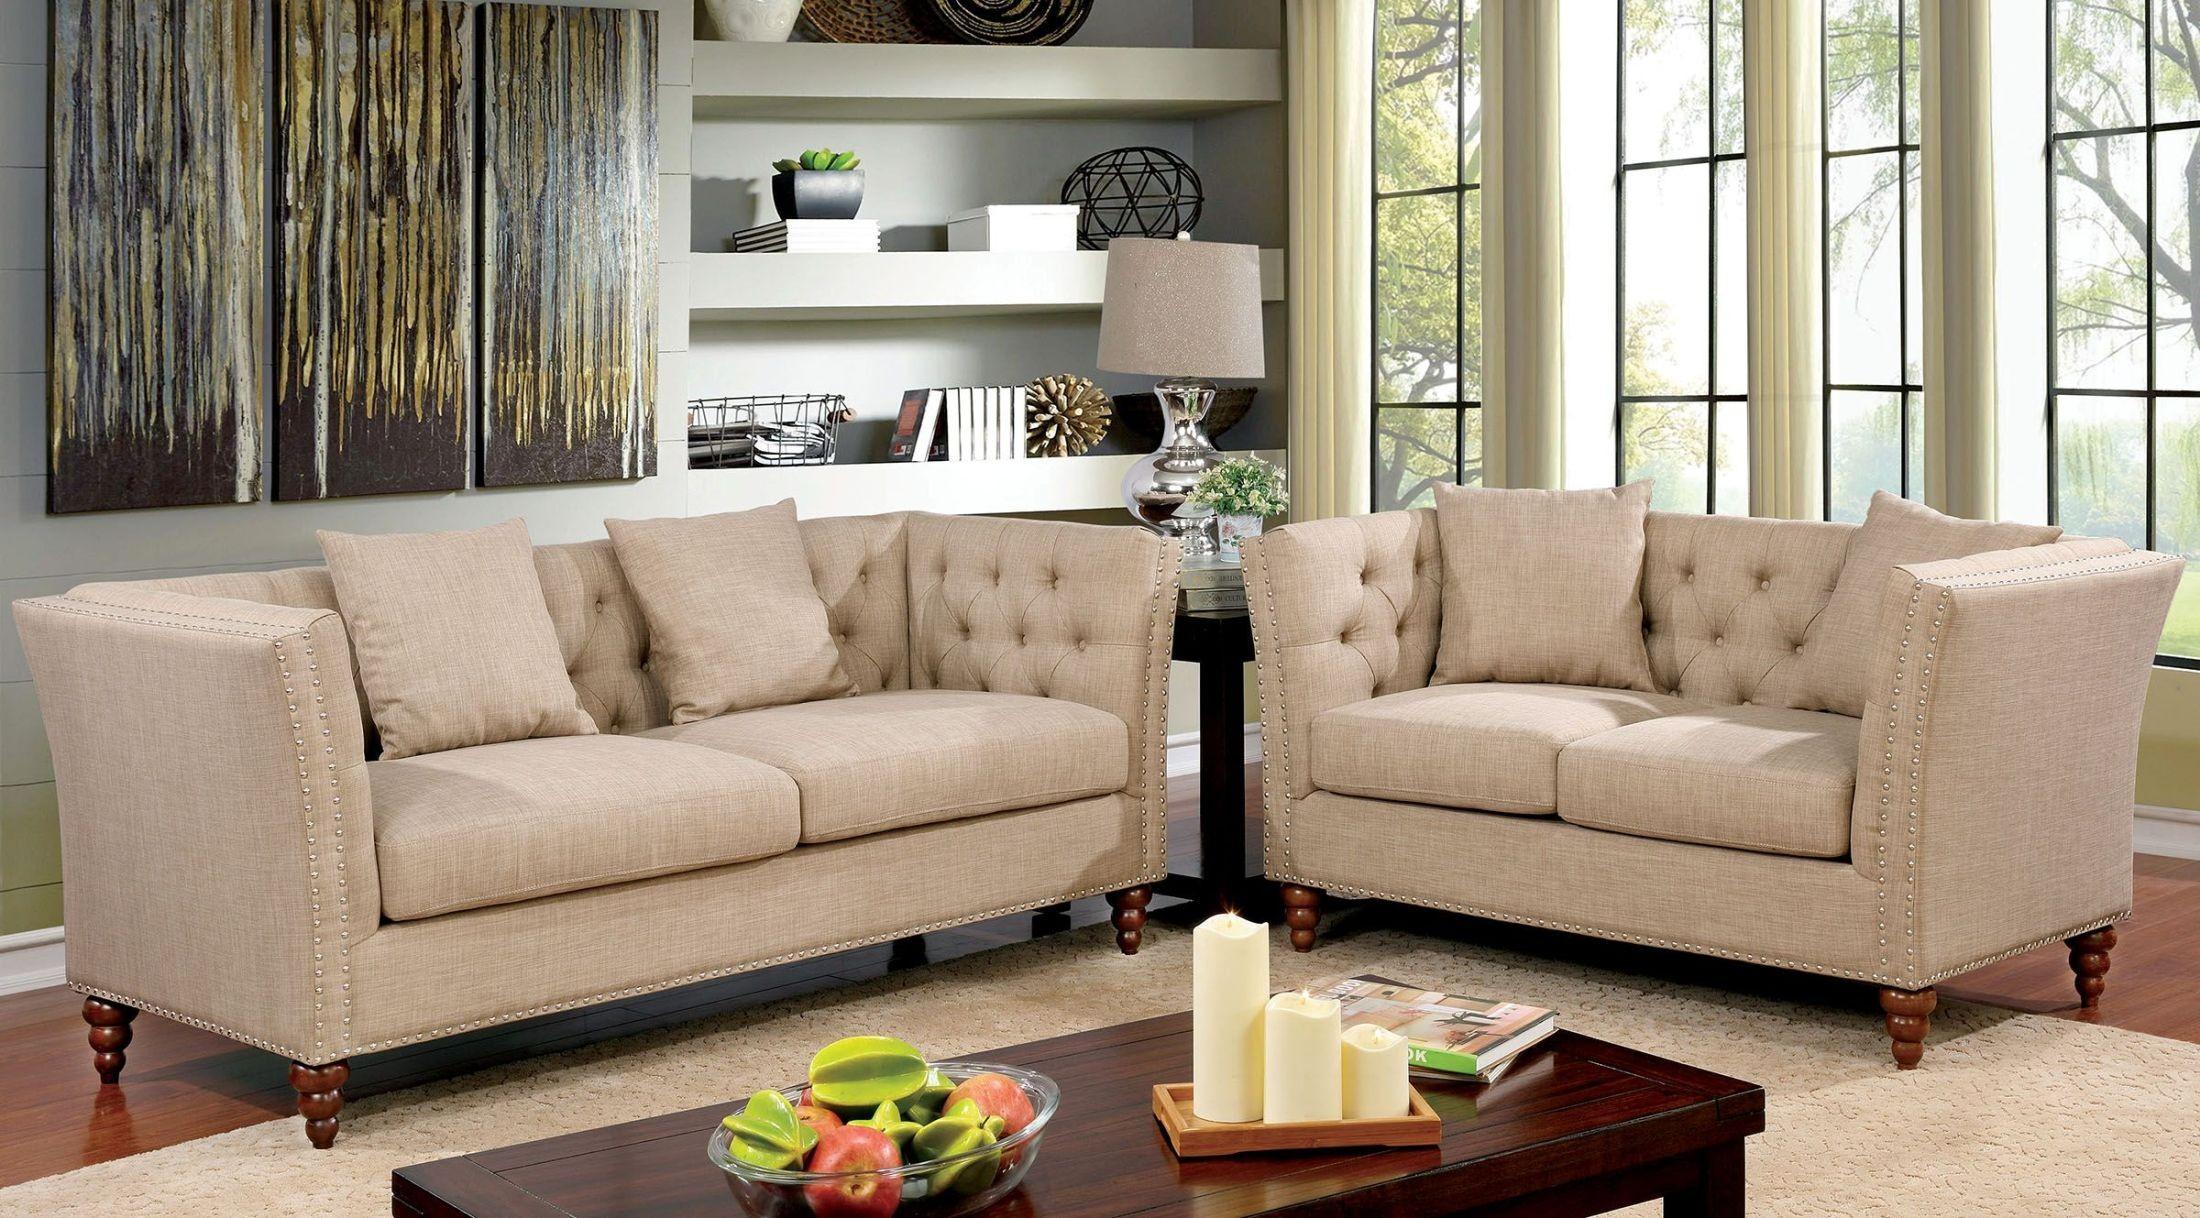 classy oak living room livings beige andria pin fabric acacia the set wood